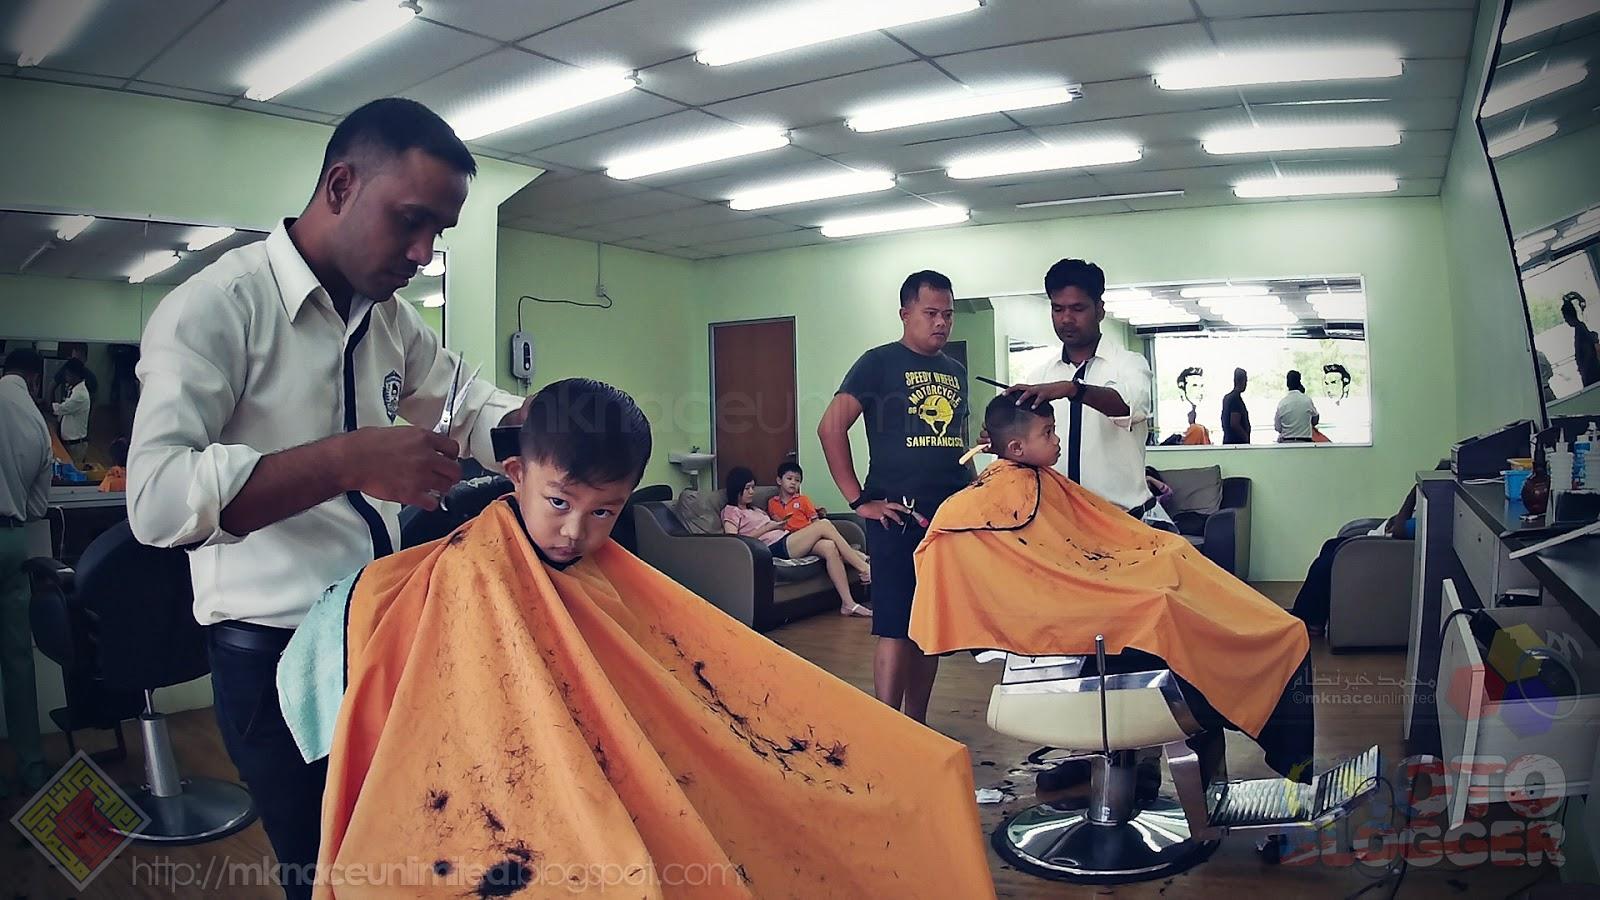 Both Haziq Haircut   Ravi. Sebut nak gunting rambut je sakan nak ngikut.  Bagus la. So. Dah senang sikit dah team jantan la ni. Start kereta terus gi  ravi. 0d551a1dbf